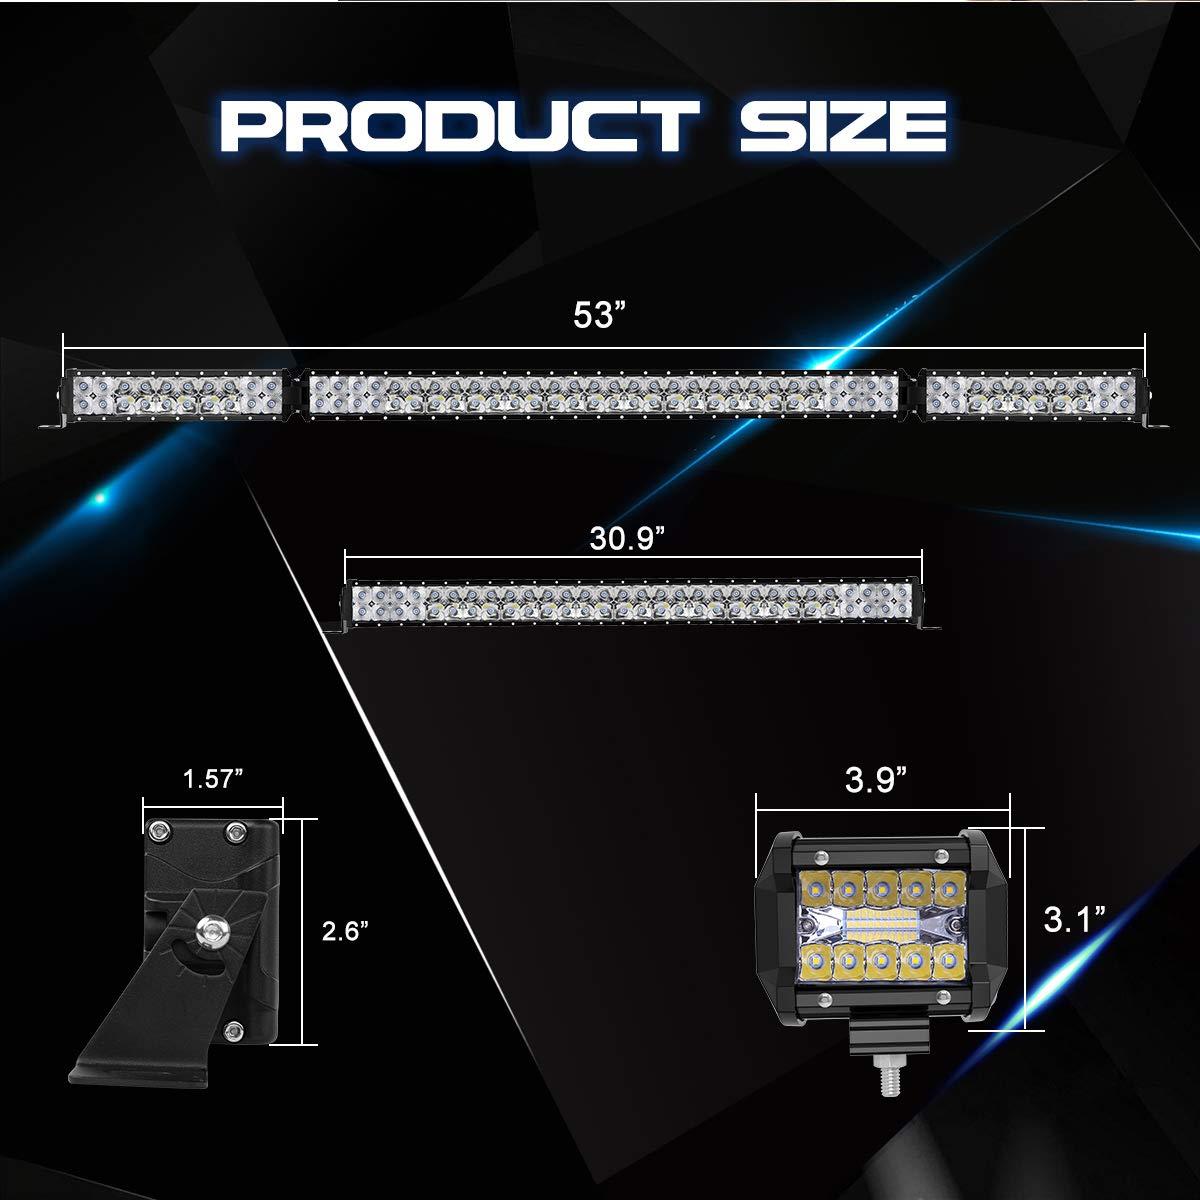 4PCS 4 LED Light Pods for Jeep Truck ATV Rigidhorse 28000LM 42 Inch LED Light Bar Kit 22 Inch Flood Spot Beam Combo White LED Light Bars 3 Years Warranty